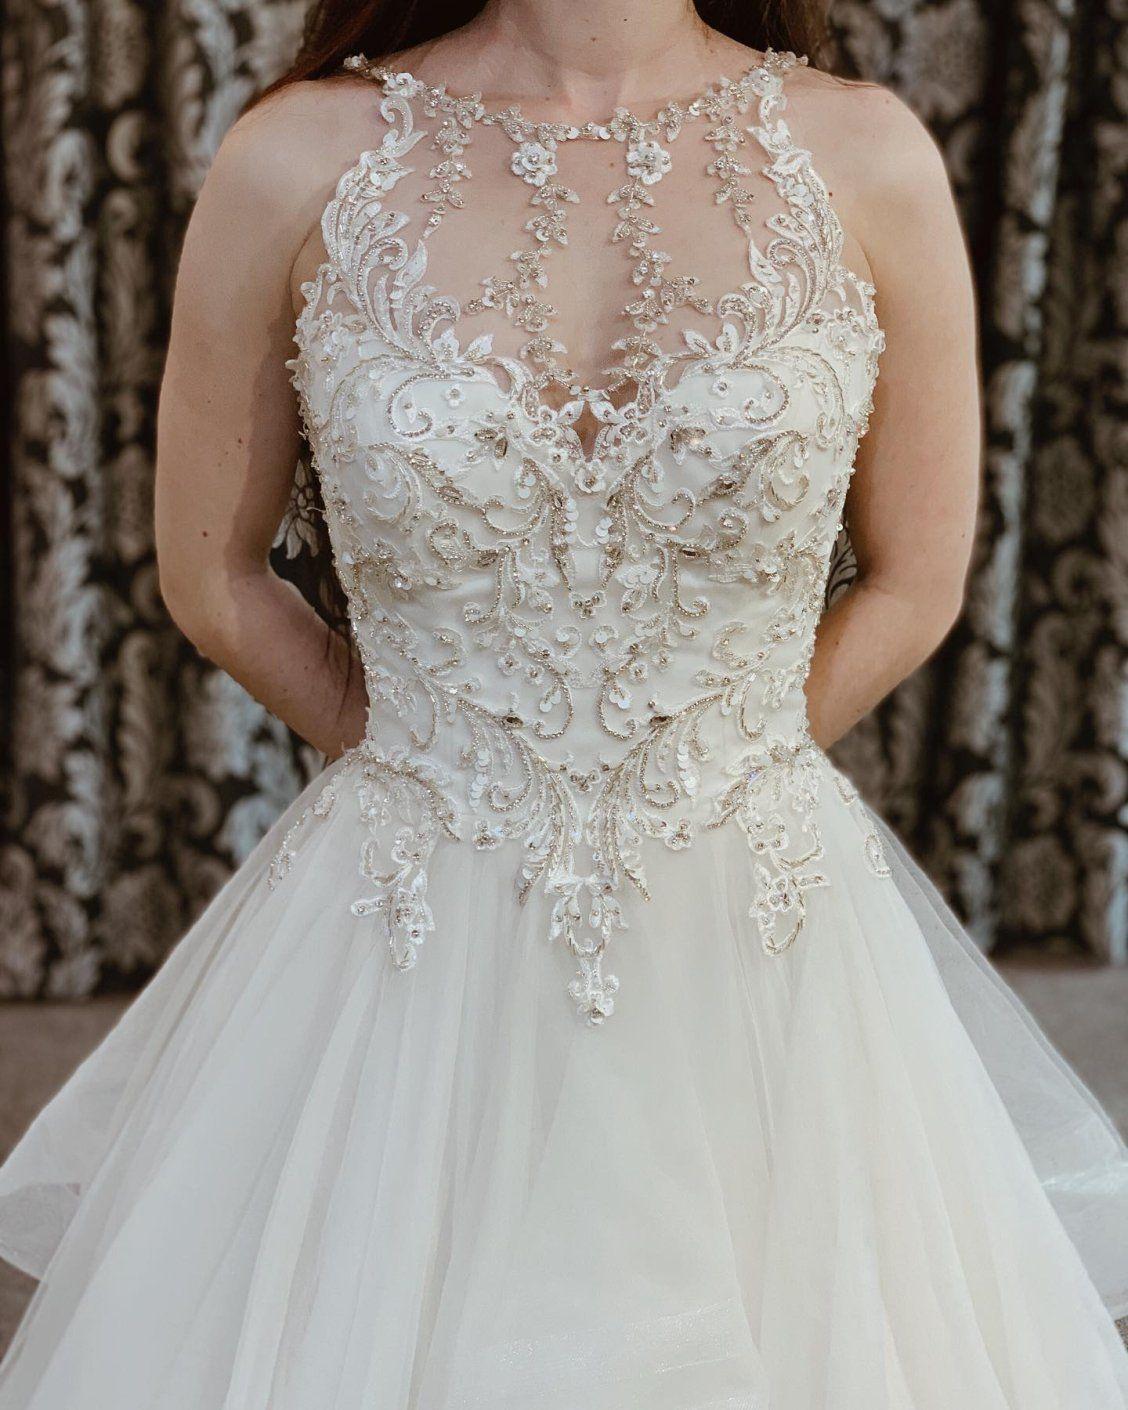 Unique Princess Ball Gown Wedding Dresses Maggiesottero Weddingdress Weddinginspo Weddingins Ball Gowns Wedding Princess Ball Gowns Ball Gown Wedding Dress